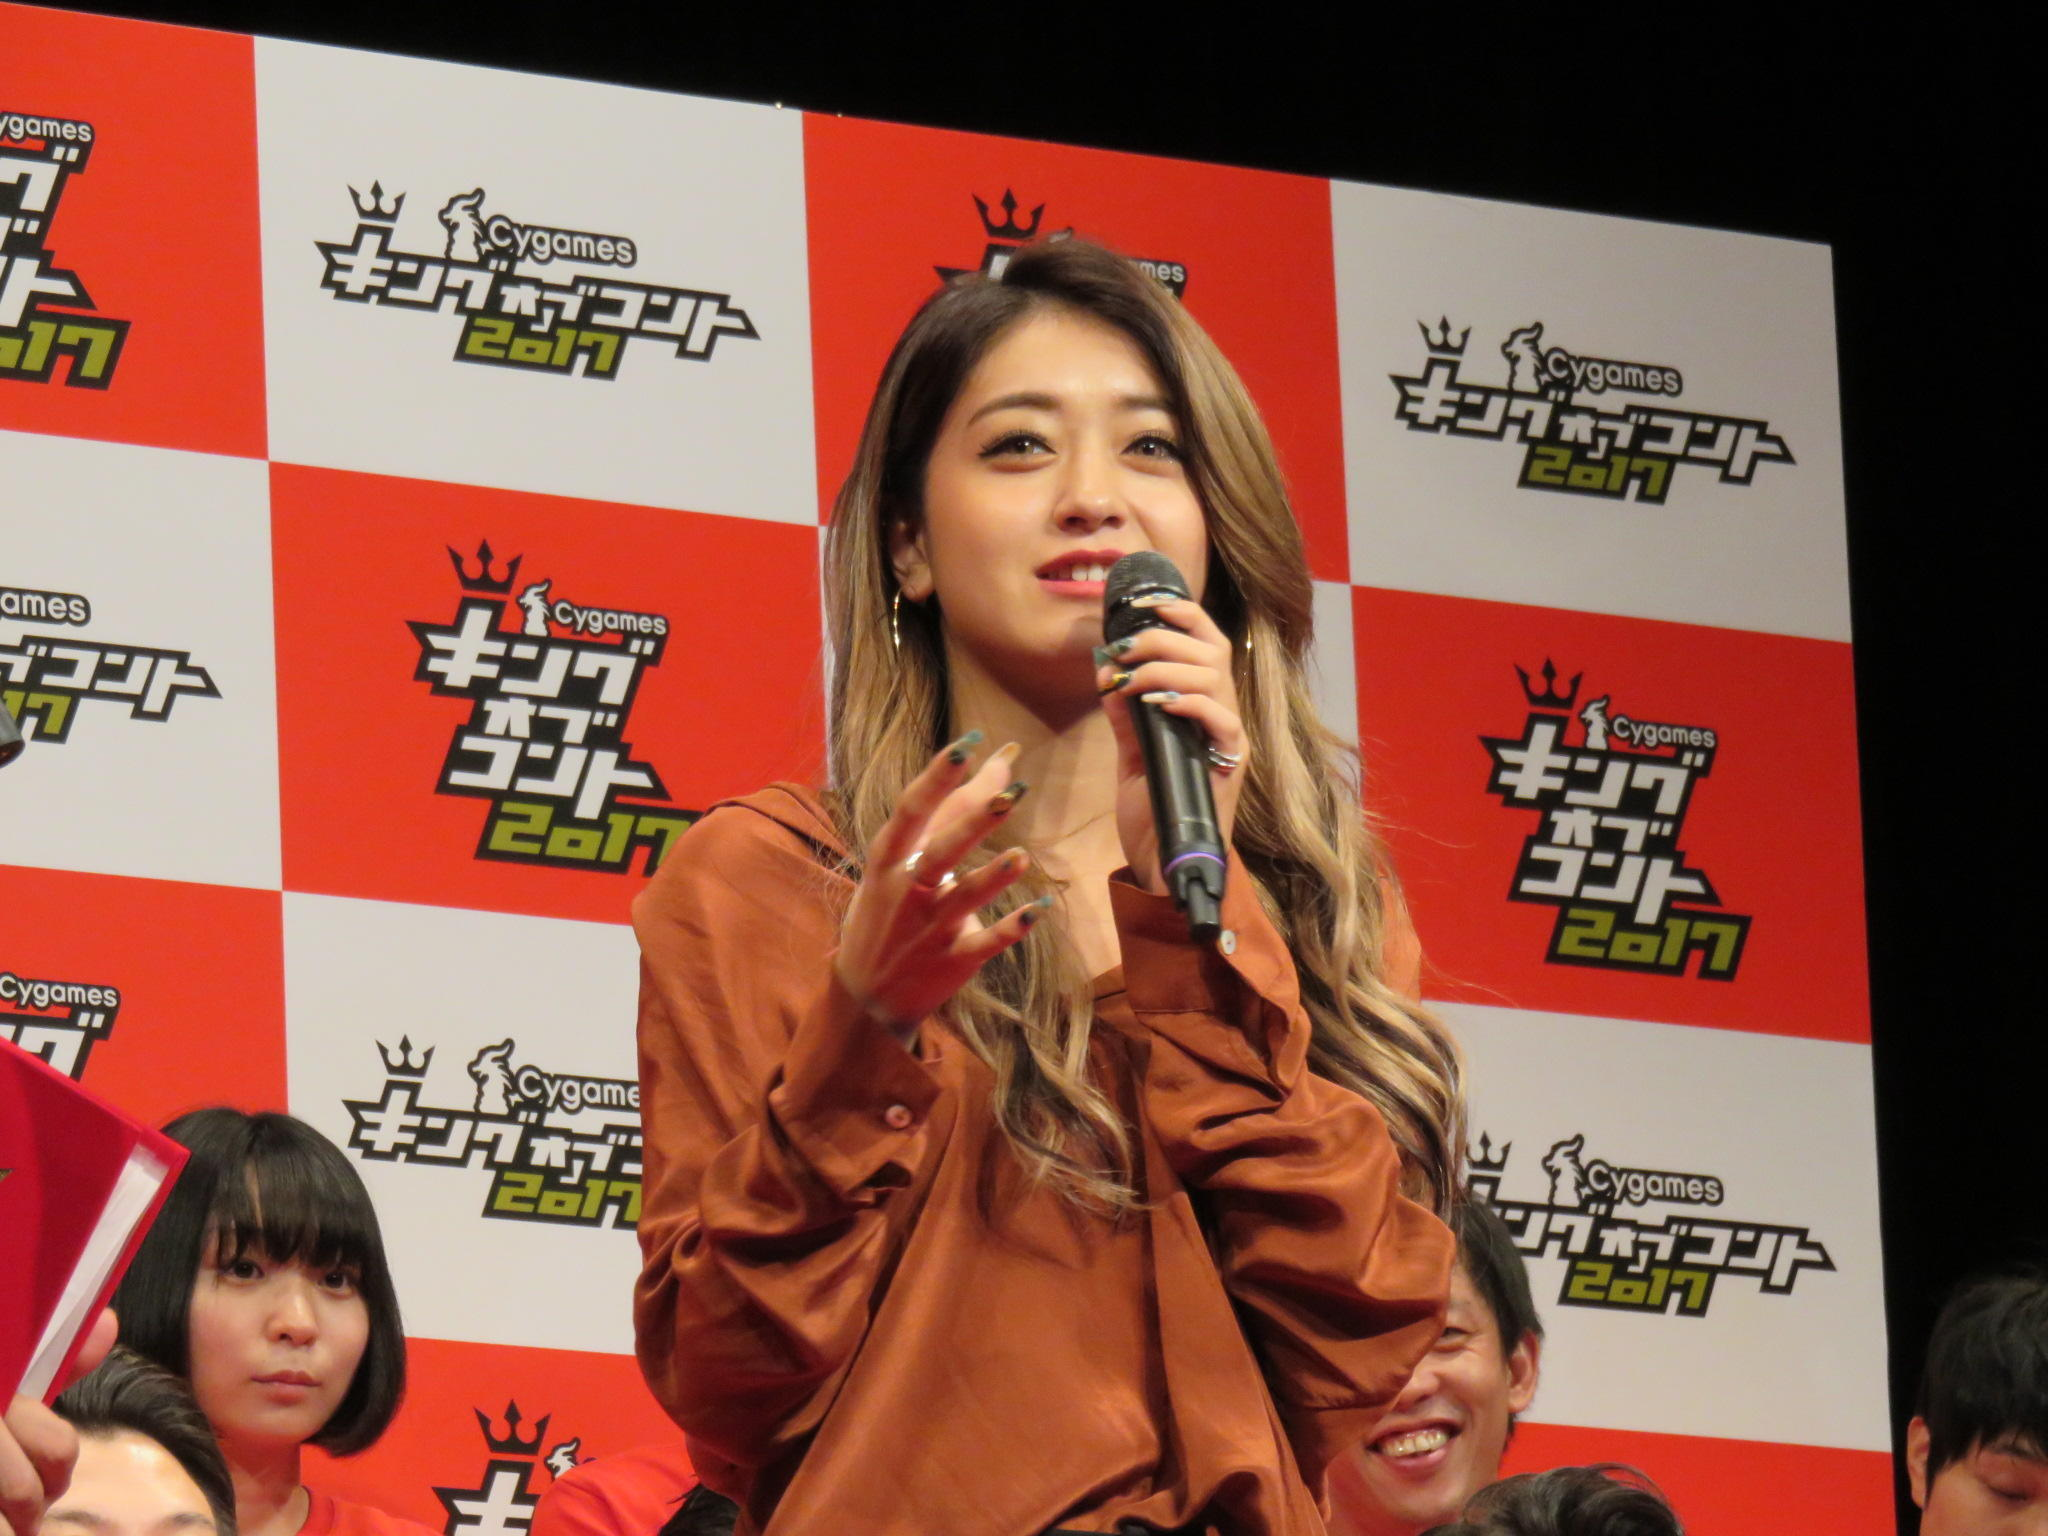 http://news.yoshimoto.co.jp/20170909010701-a9061aa395206acc8119a2a094eecf1d66372dcf.jpg